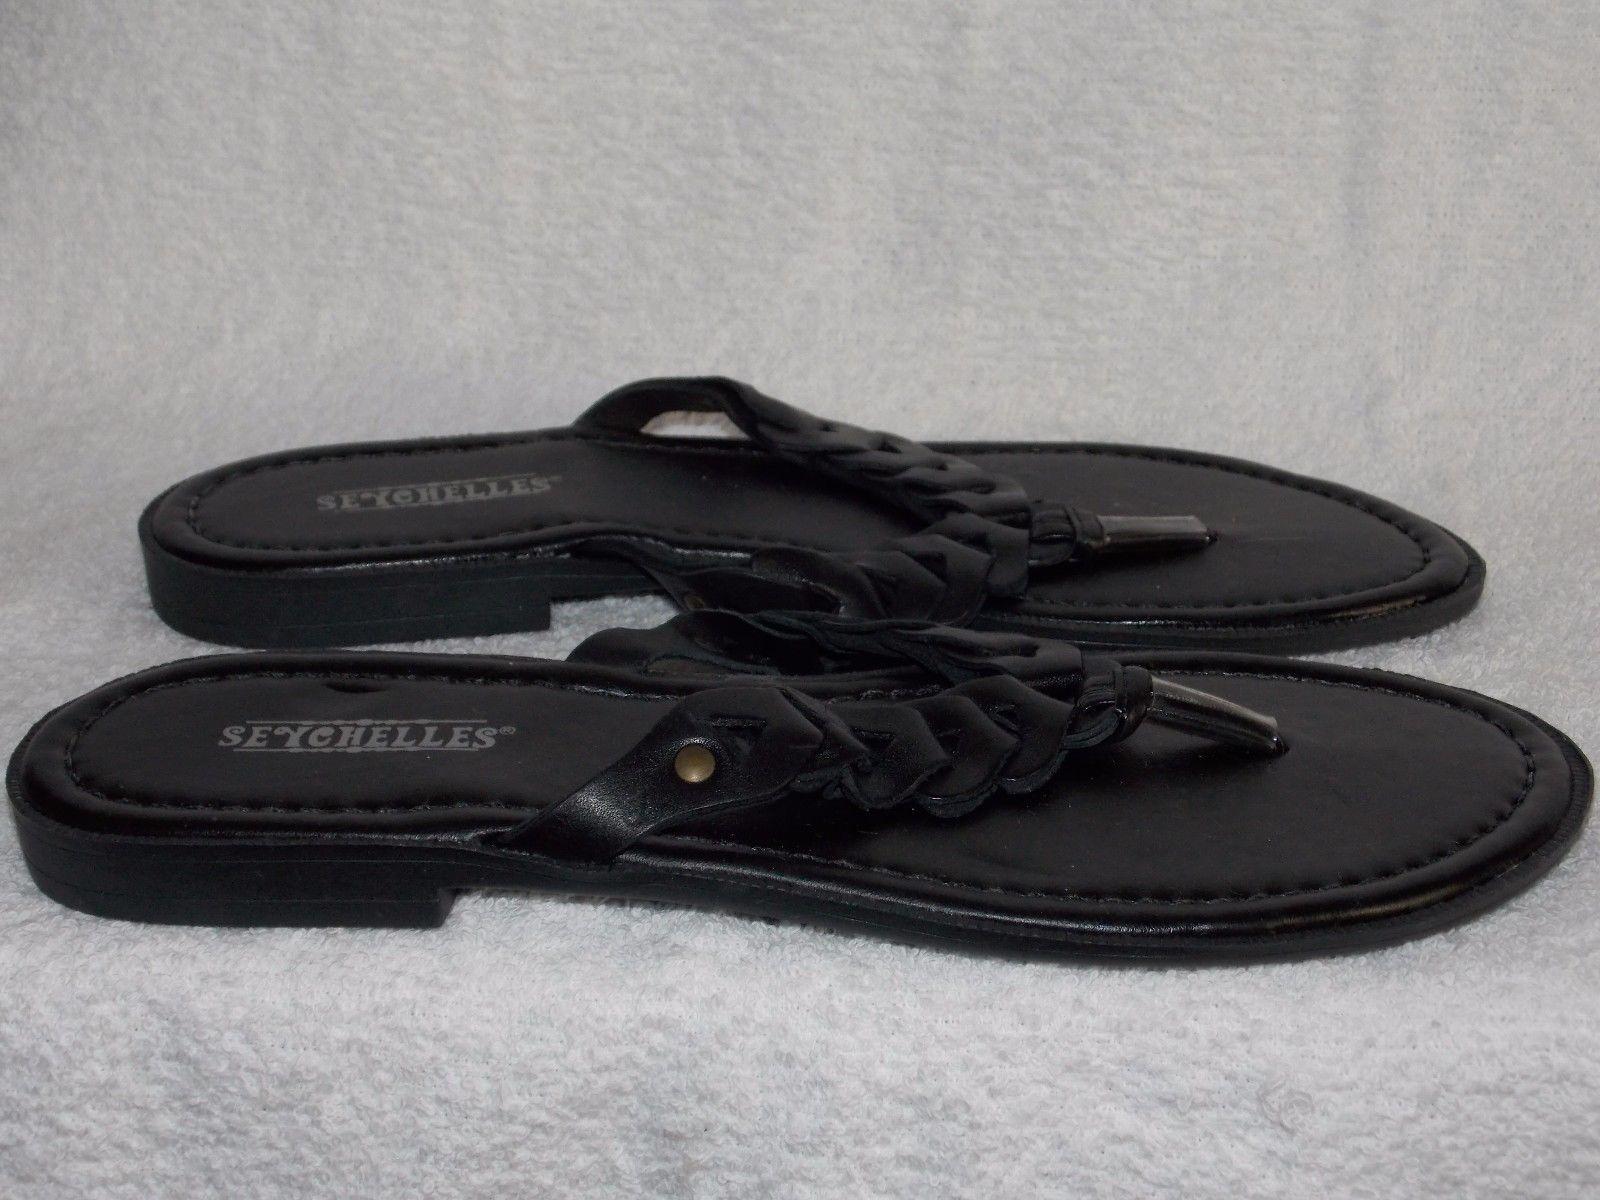 8cadc5ba8745 Seychelles Black BRAIDED Leather Thong Flip and 50 similar items